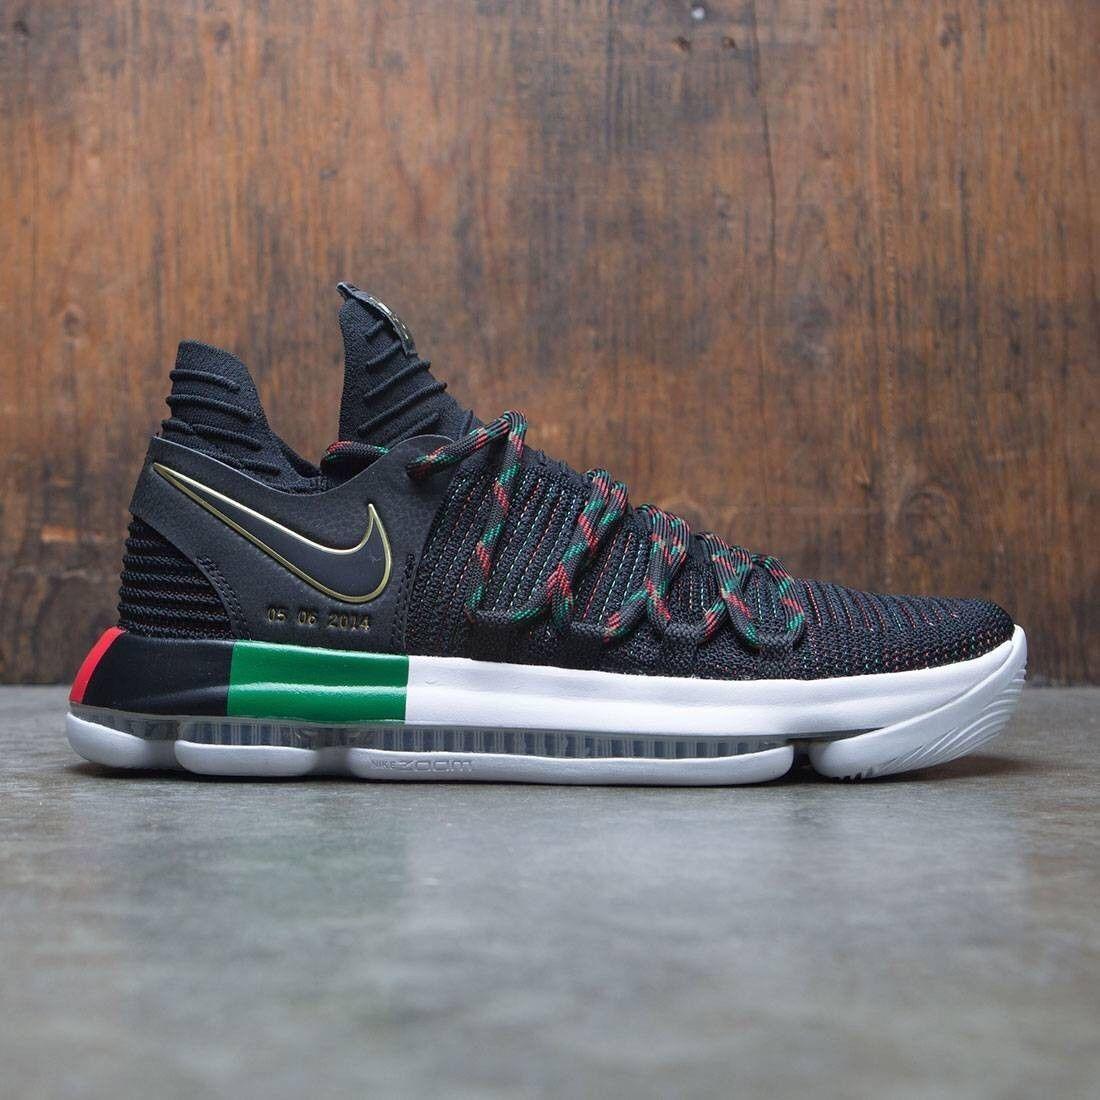 Nike Zoom KD 10 X BHM LMTD Size 10. 897817-003 Jordan Kobe